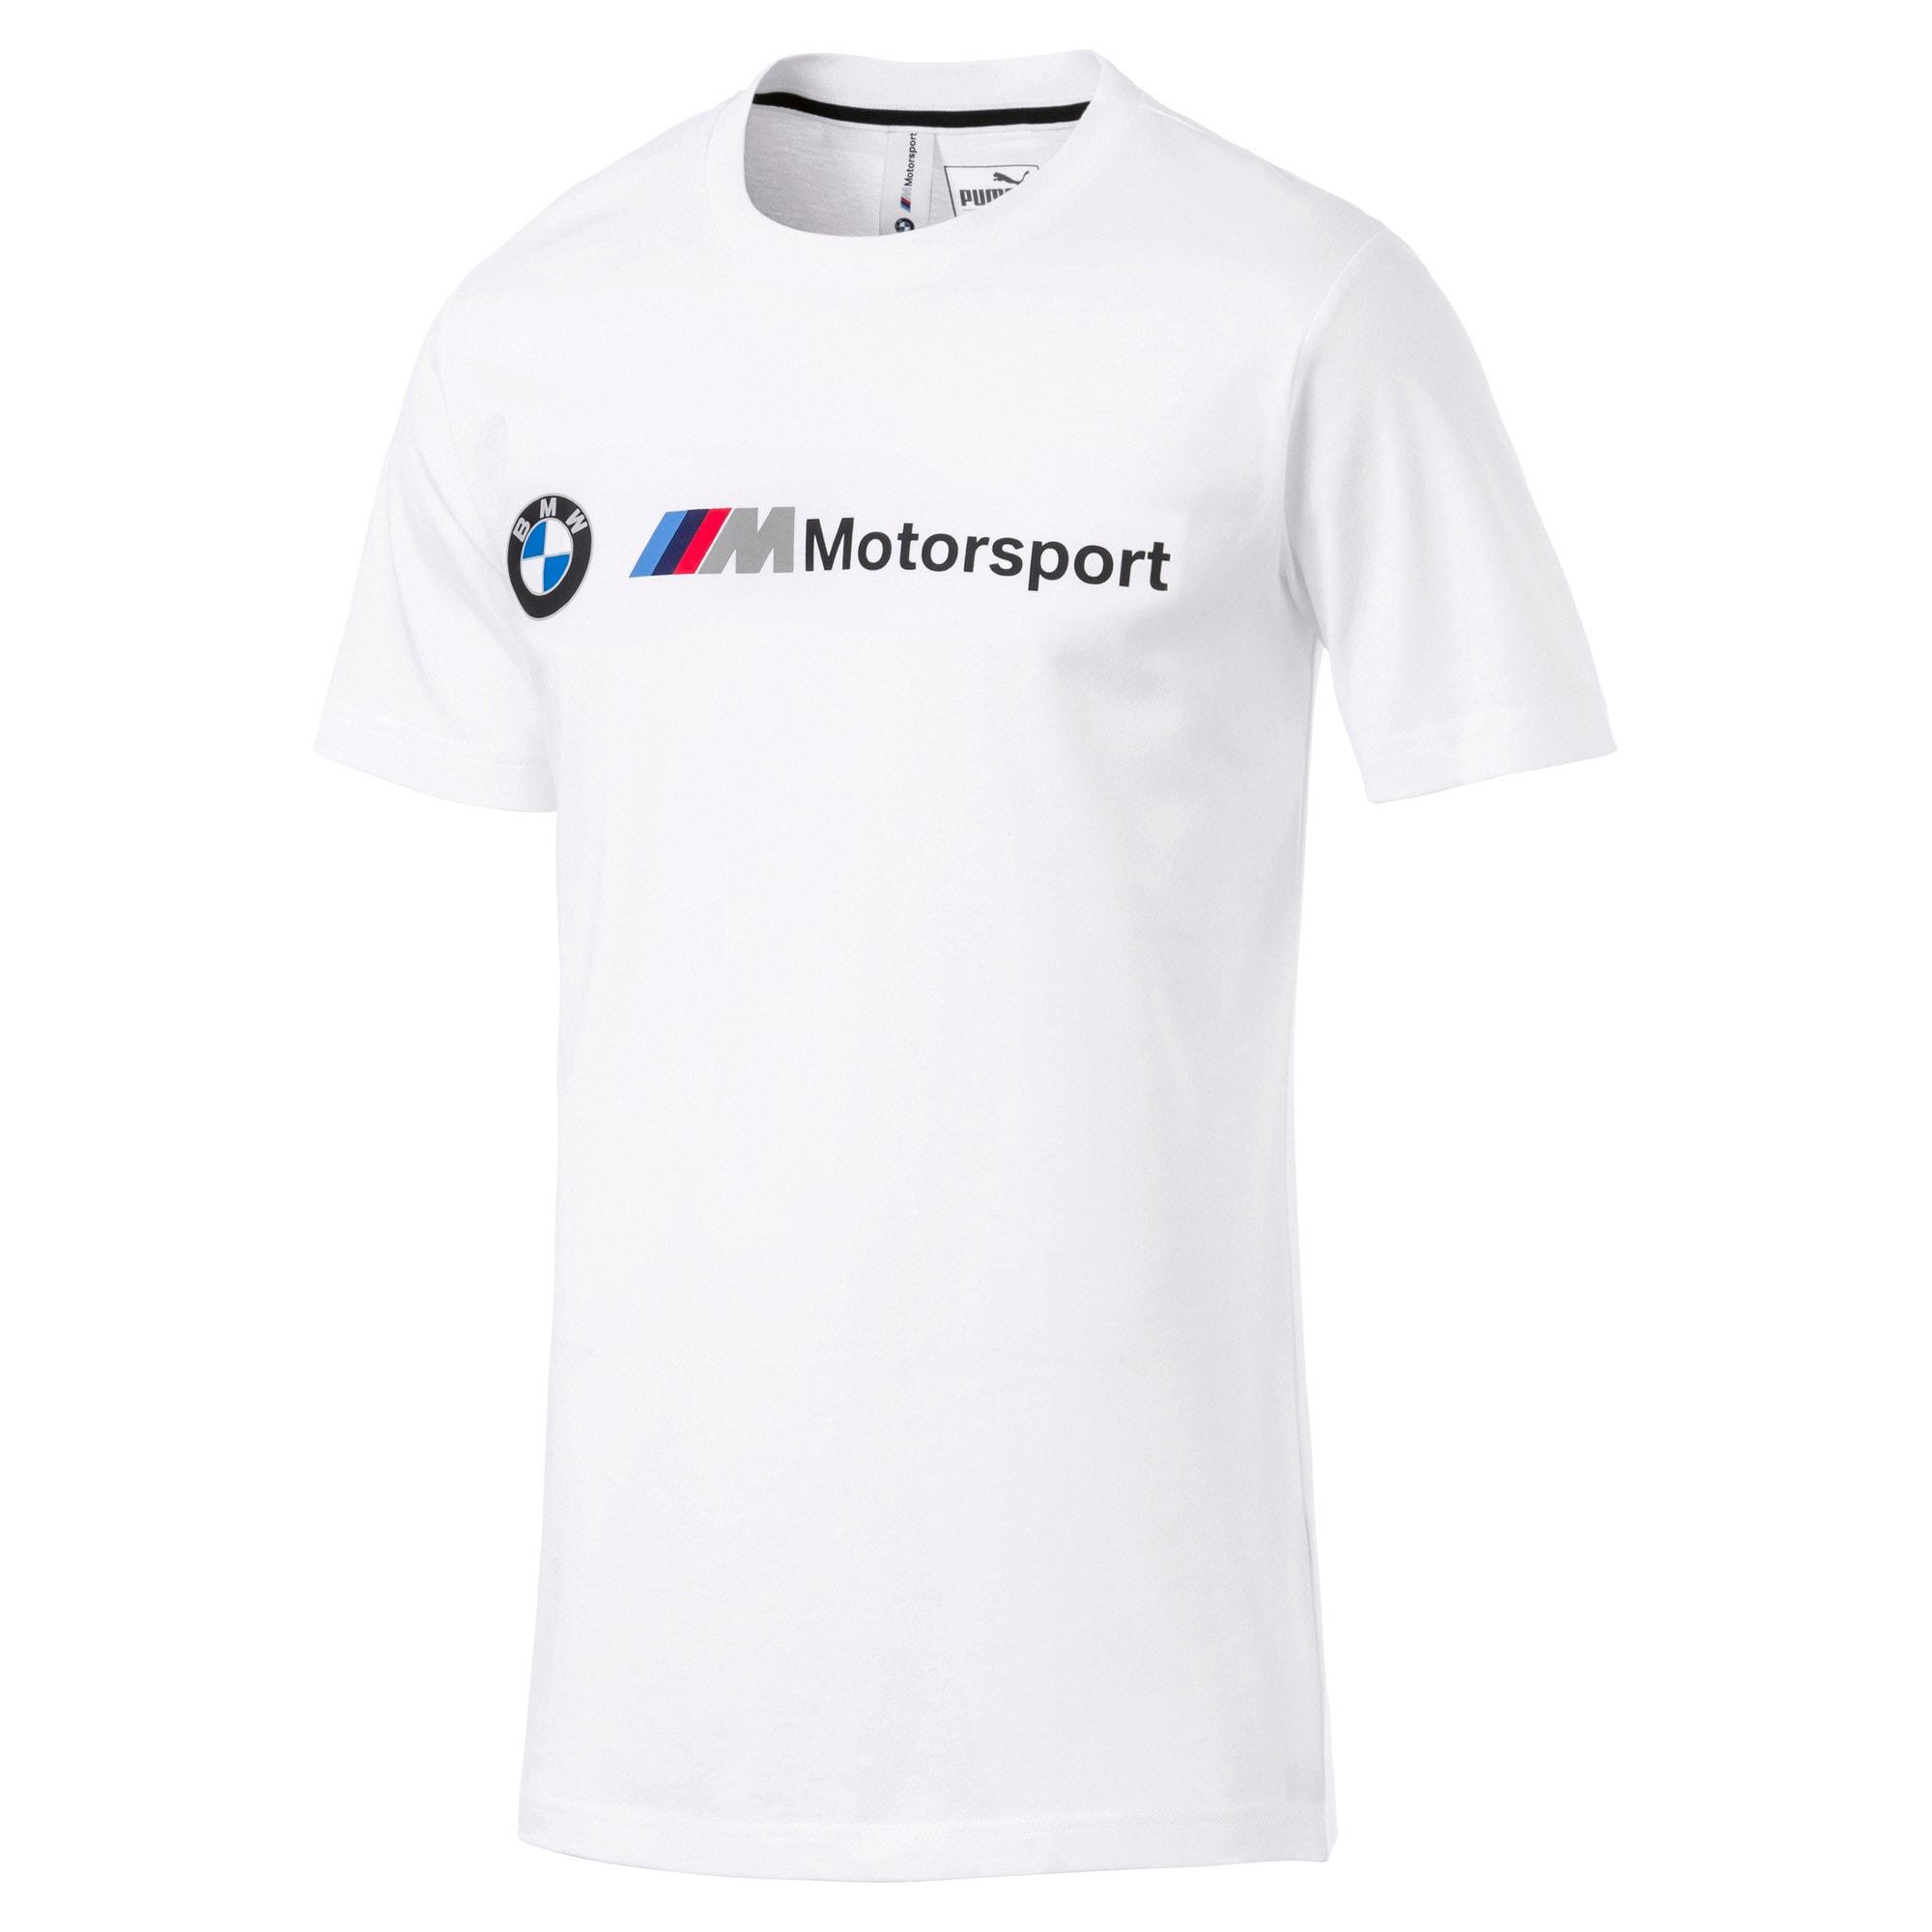 Thumbnail 4 of T-shirt con logo BMW M Motorsport uomo, Puma White, medium